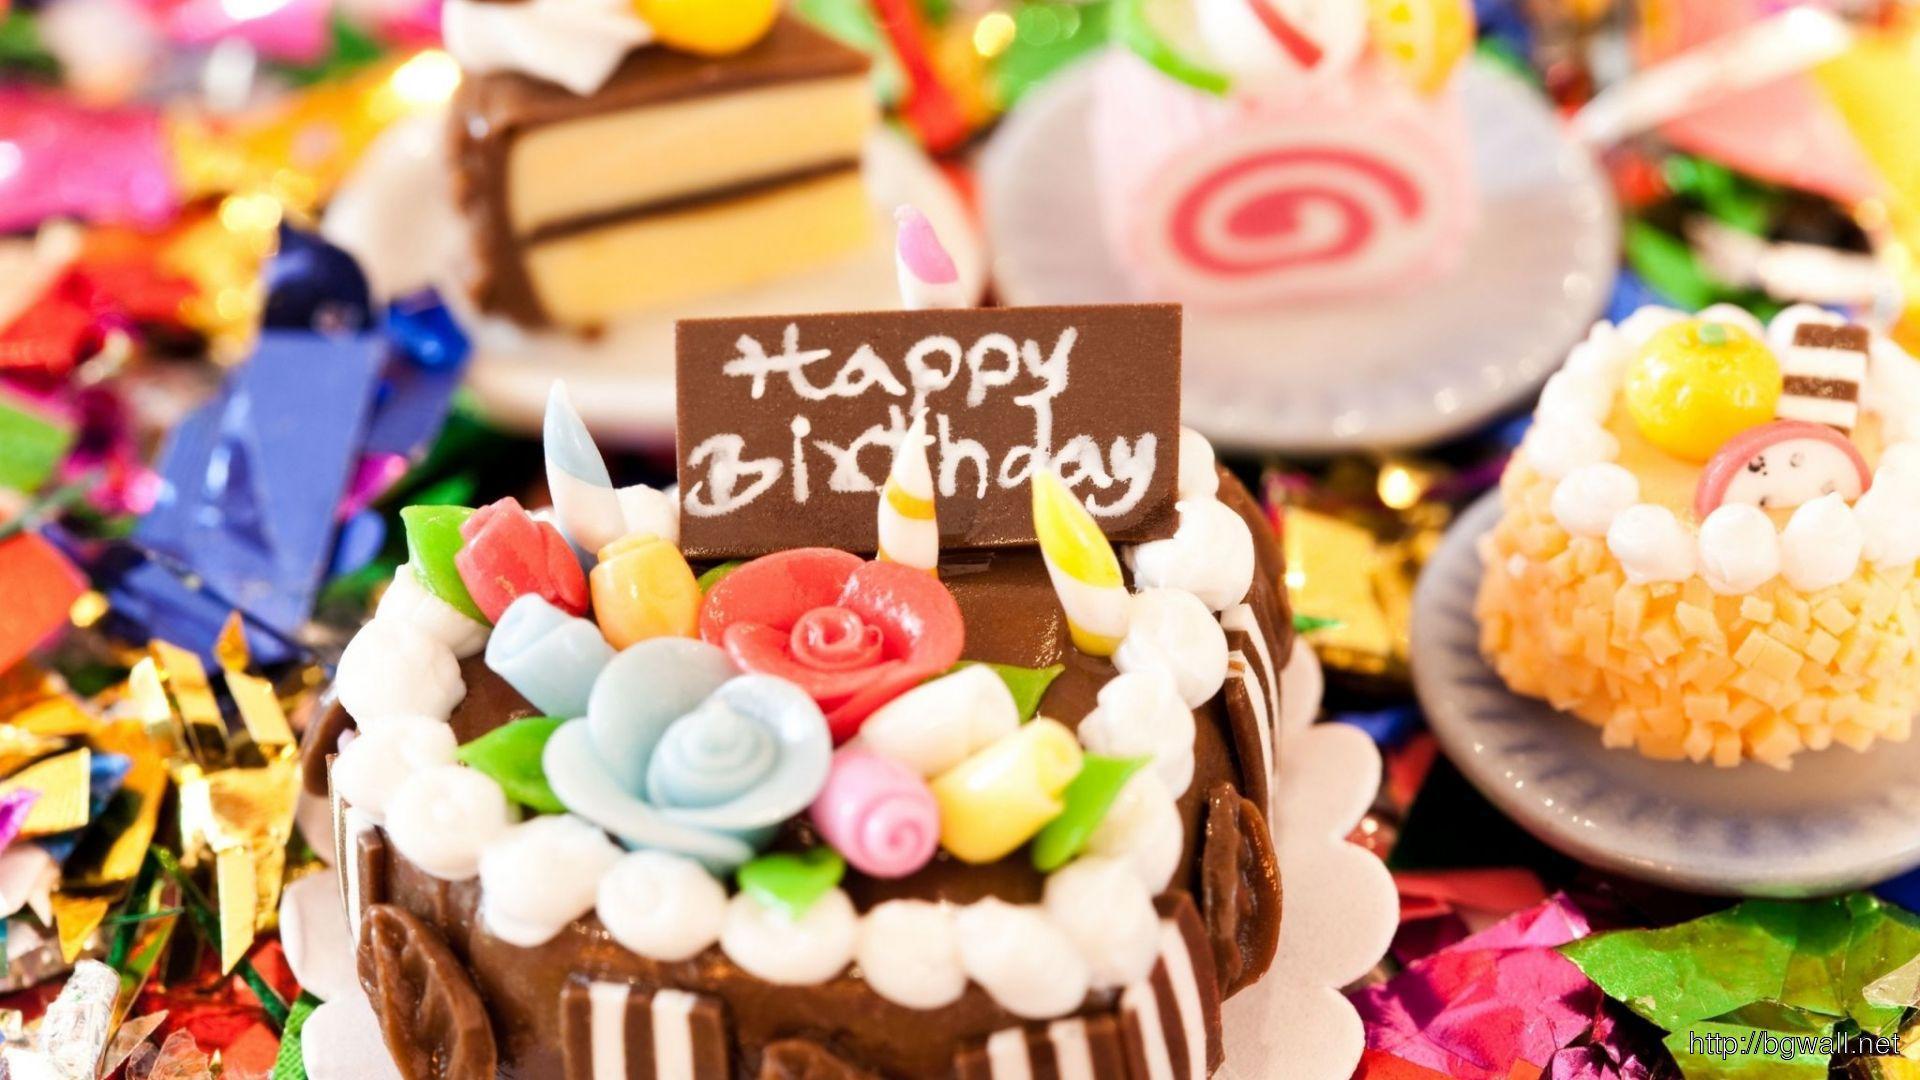 Happy Birthday Missy Cake Images